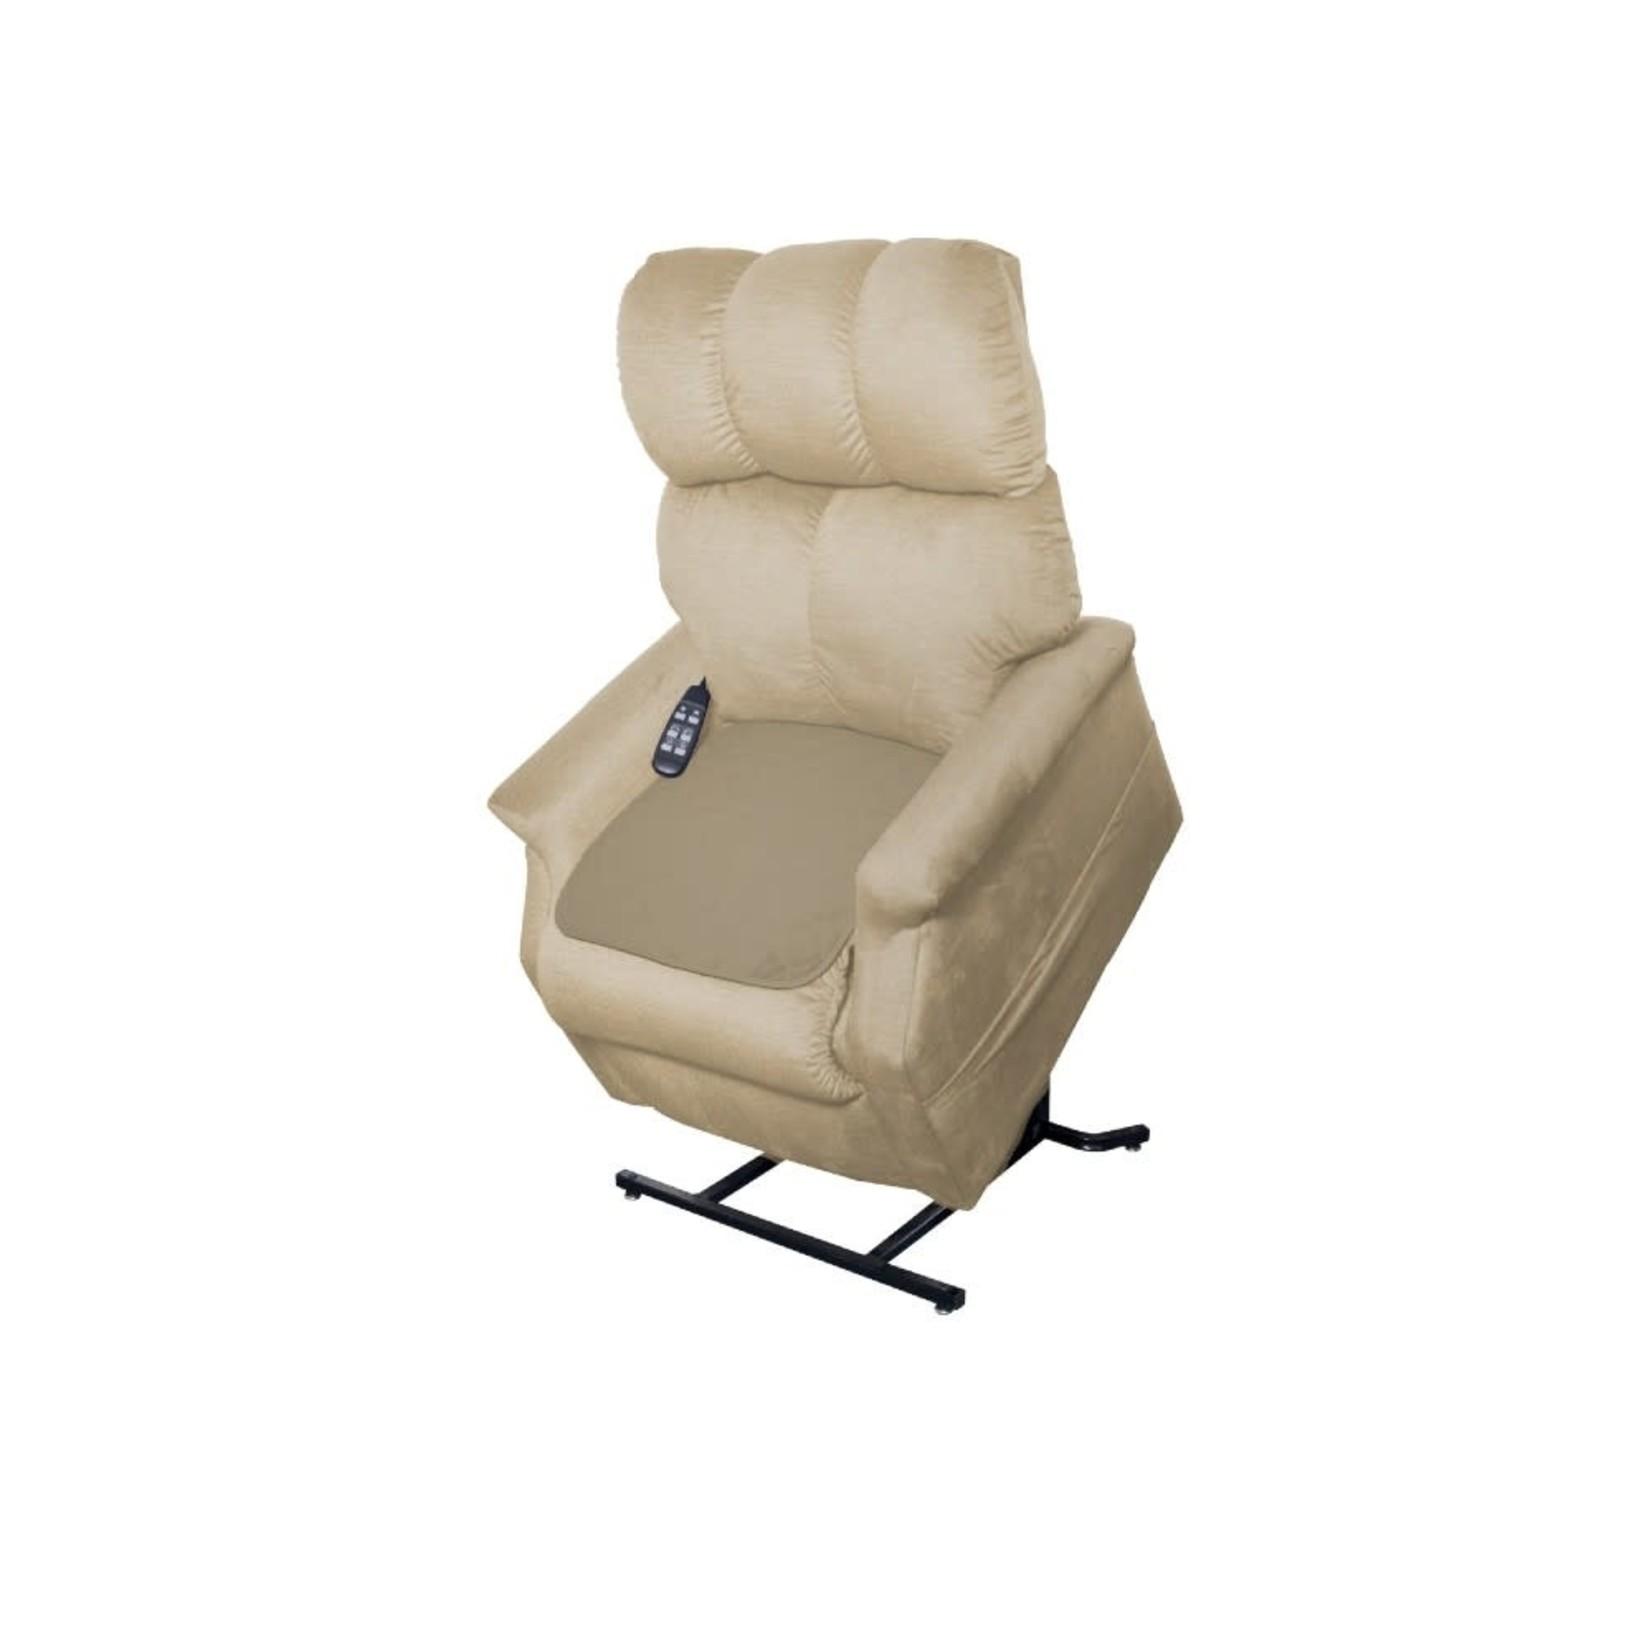 Essential Medical Furniture pad 20x20 Tan